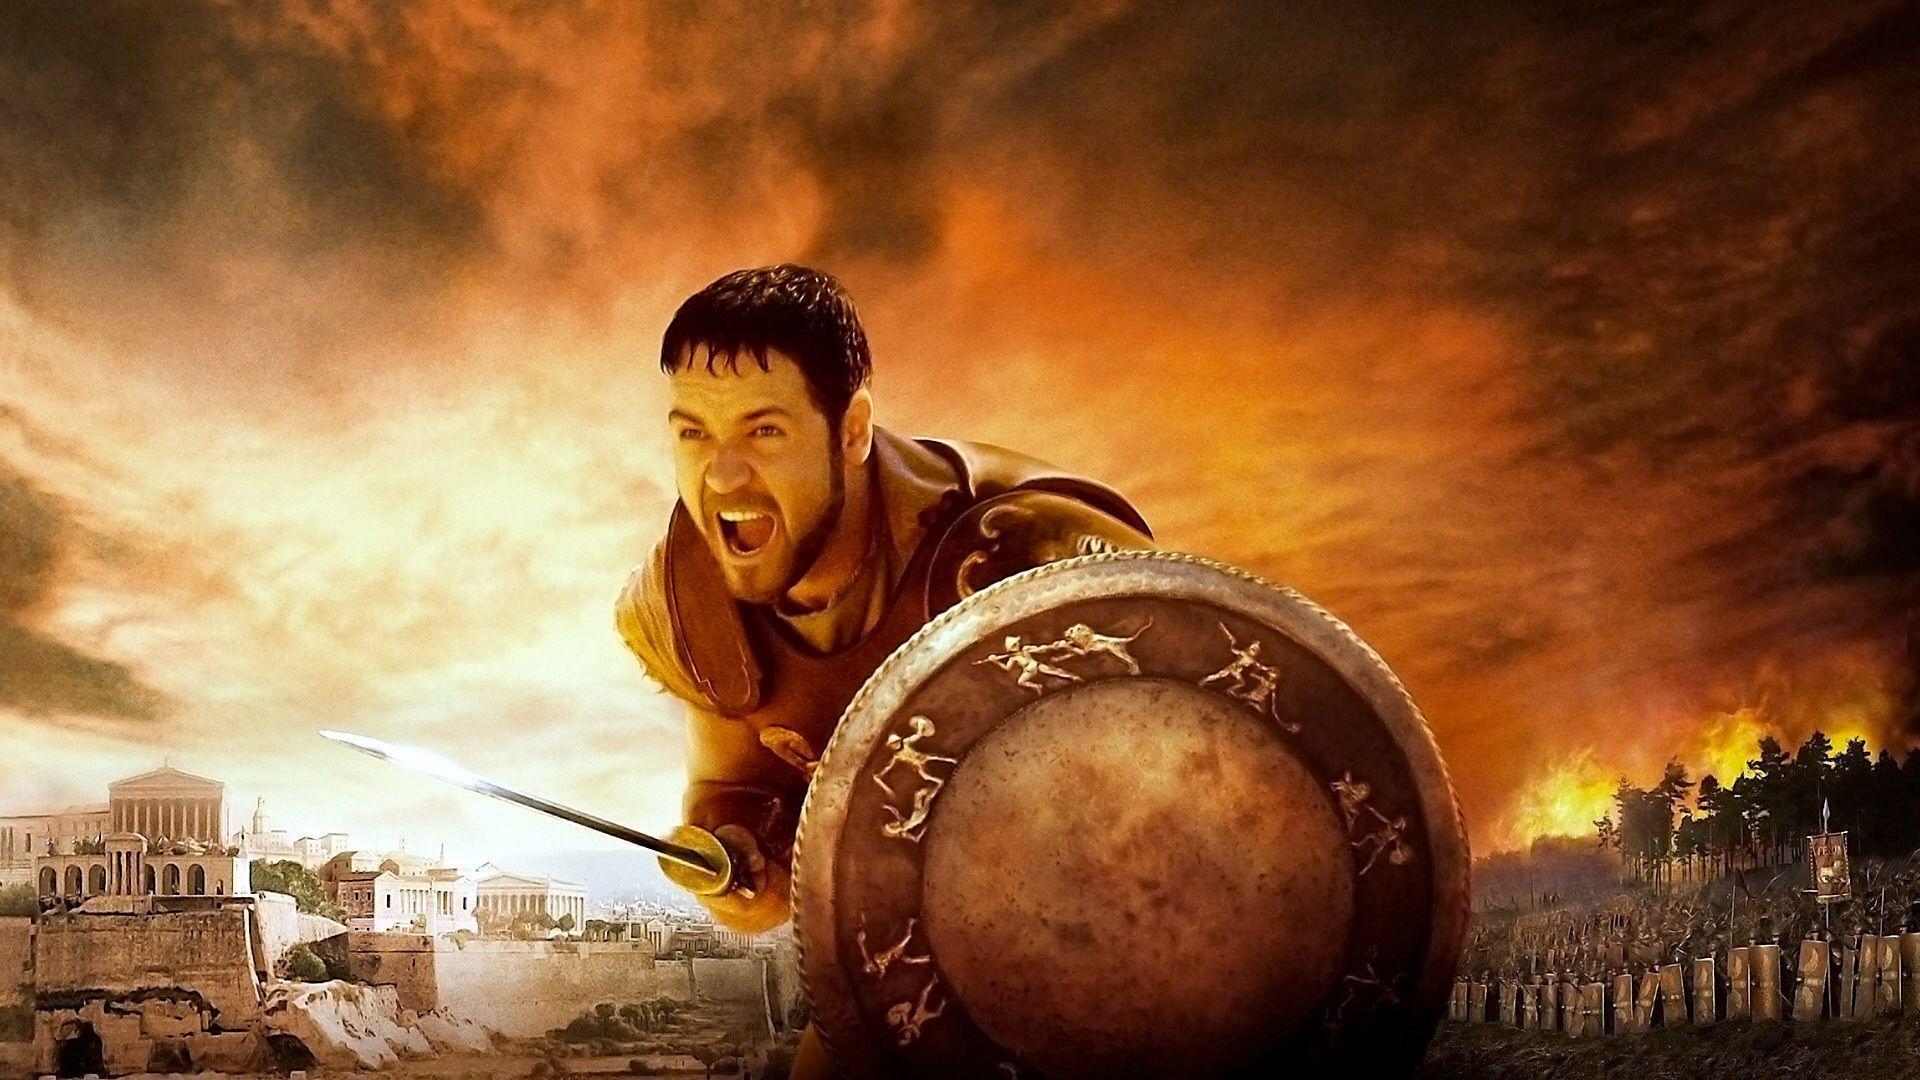 Gladiator Movie Wallpaper | Gladiator Movie Photos | Cool Wallpapers